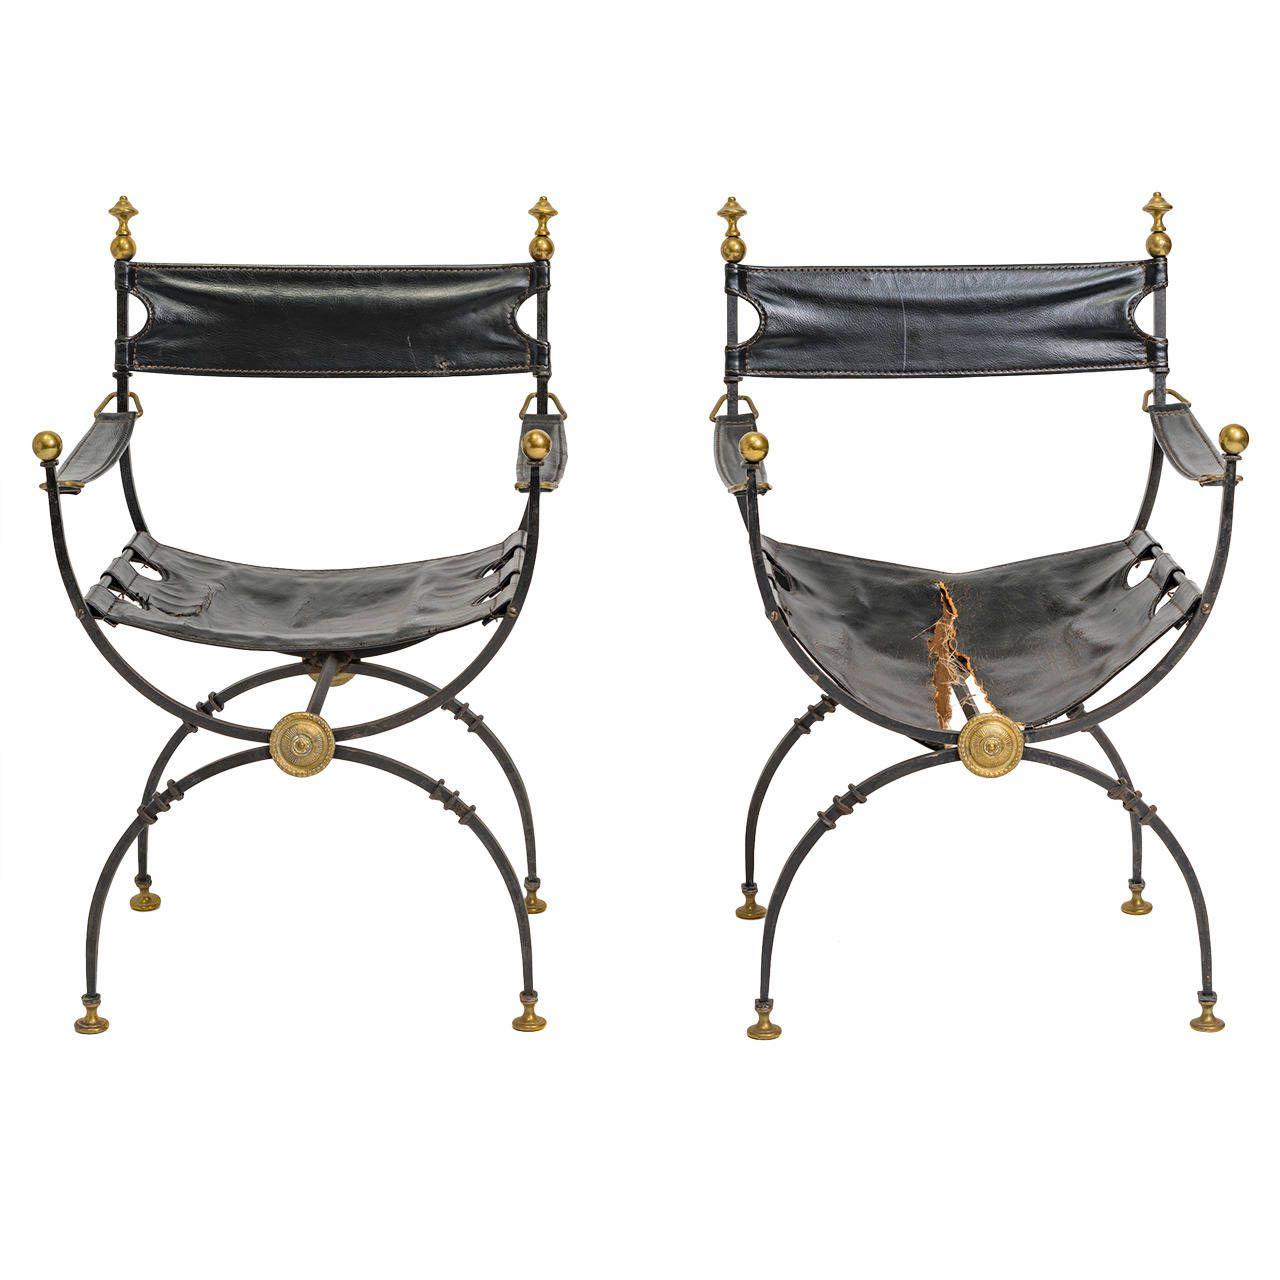 Modern savonarola chair - Pair Of Iron And Brass Savonarola Chairs